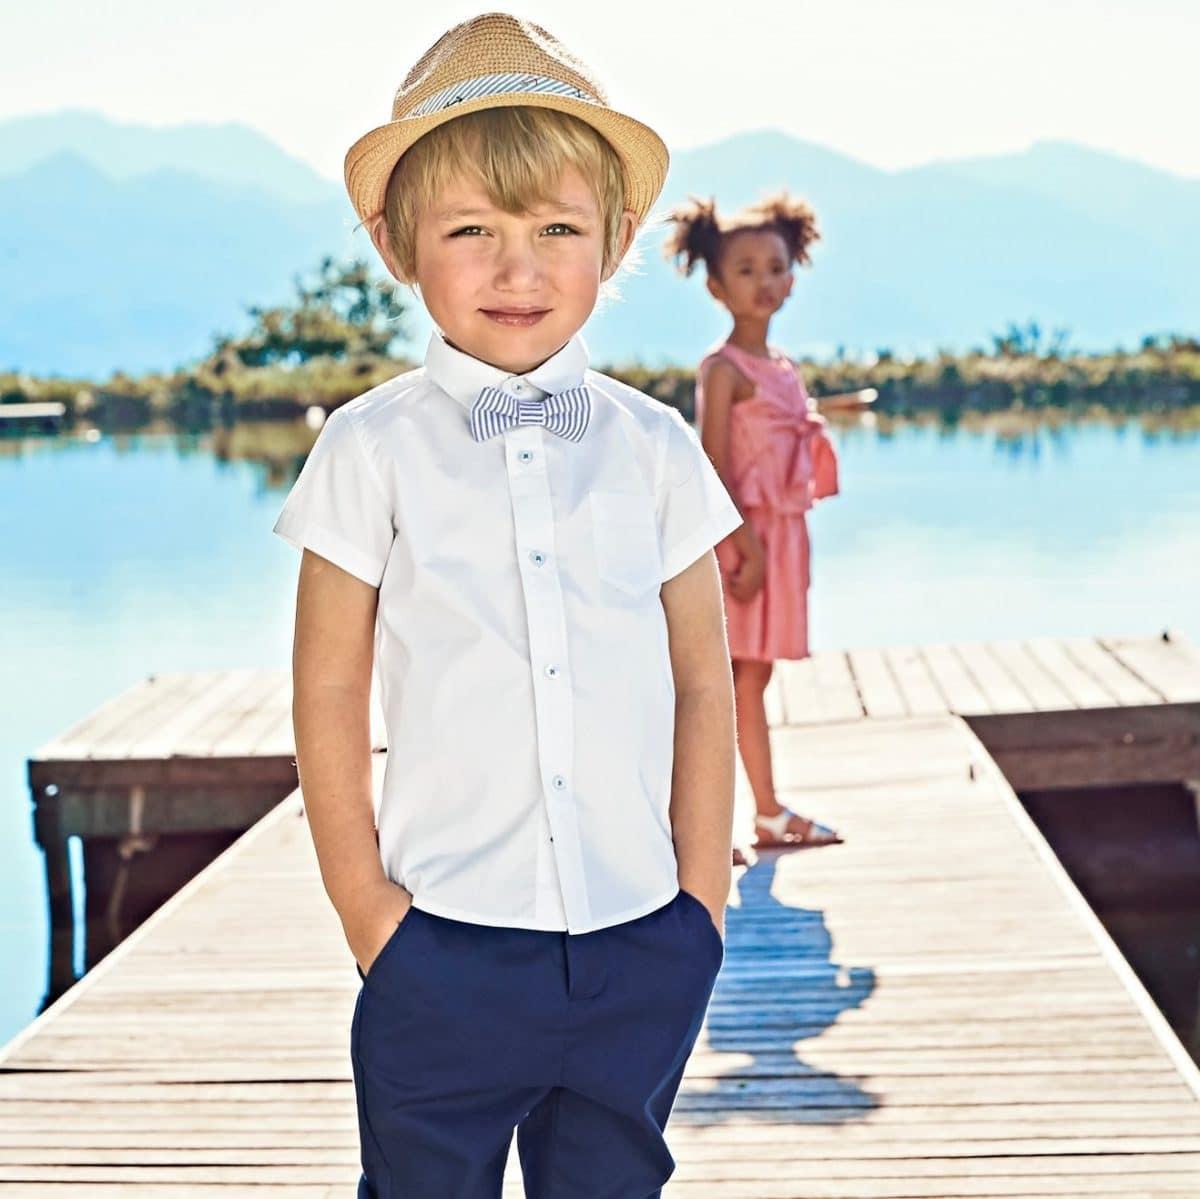 tenue-ceremonie-pour-enfant-pantalon-chino-garcon-cotonlin